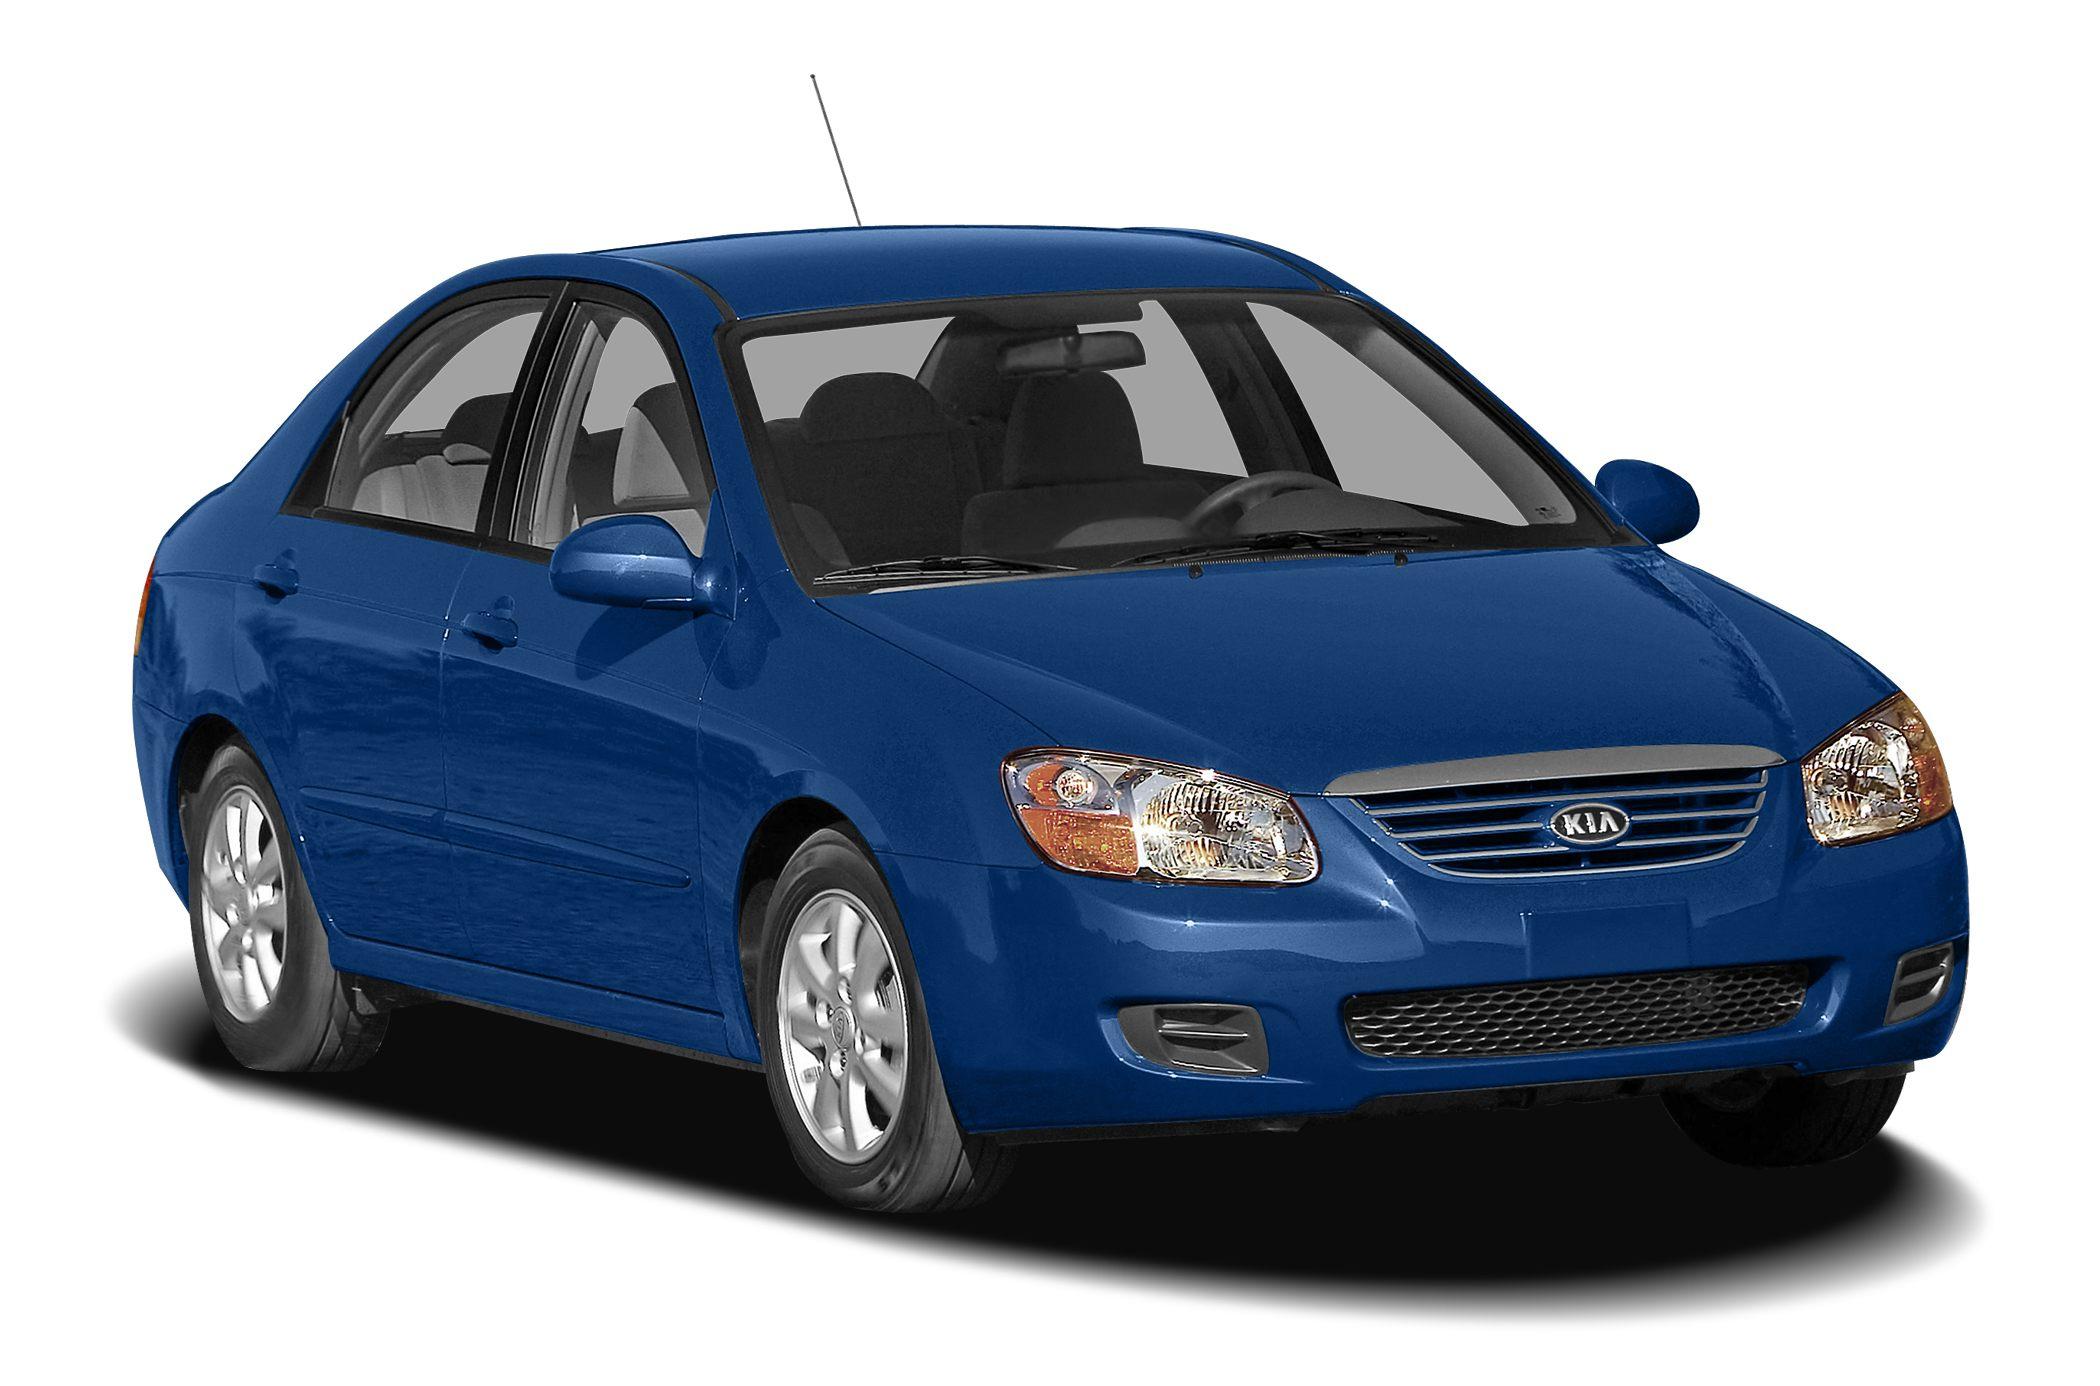 2007 Kia Spectra EX Miles 133414Color Light Blue Stock P6709A VIN KNAFE121575430348